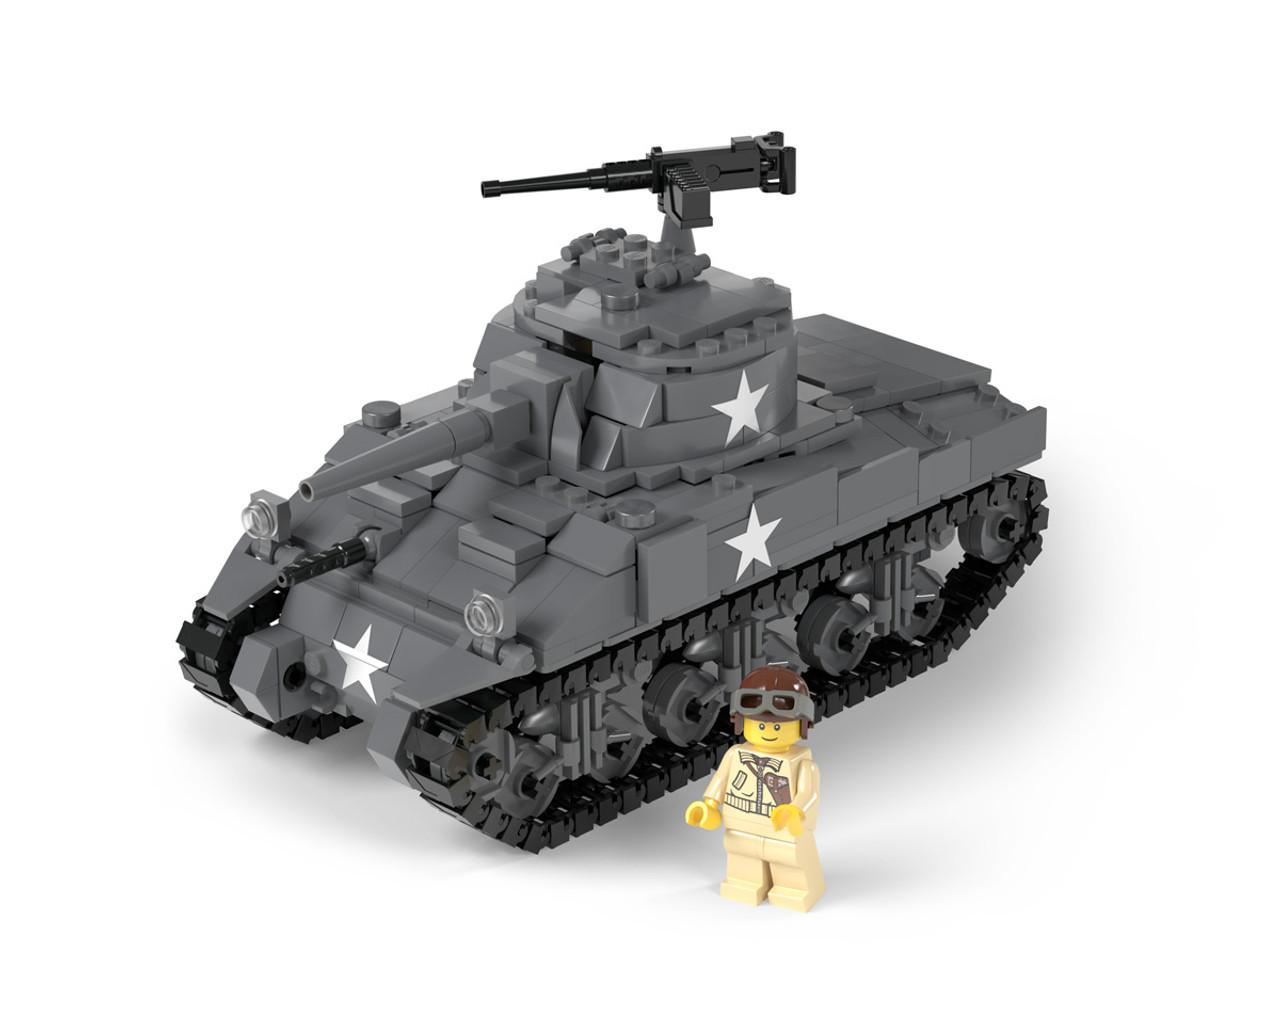 M4 Sherman - Allied Medium Tank (2018)